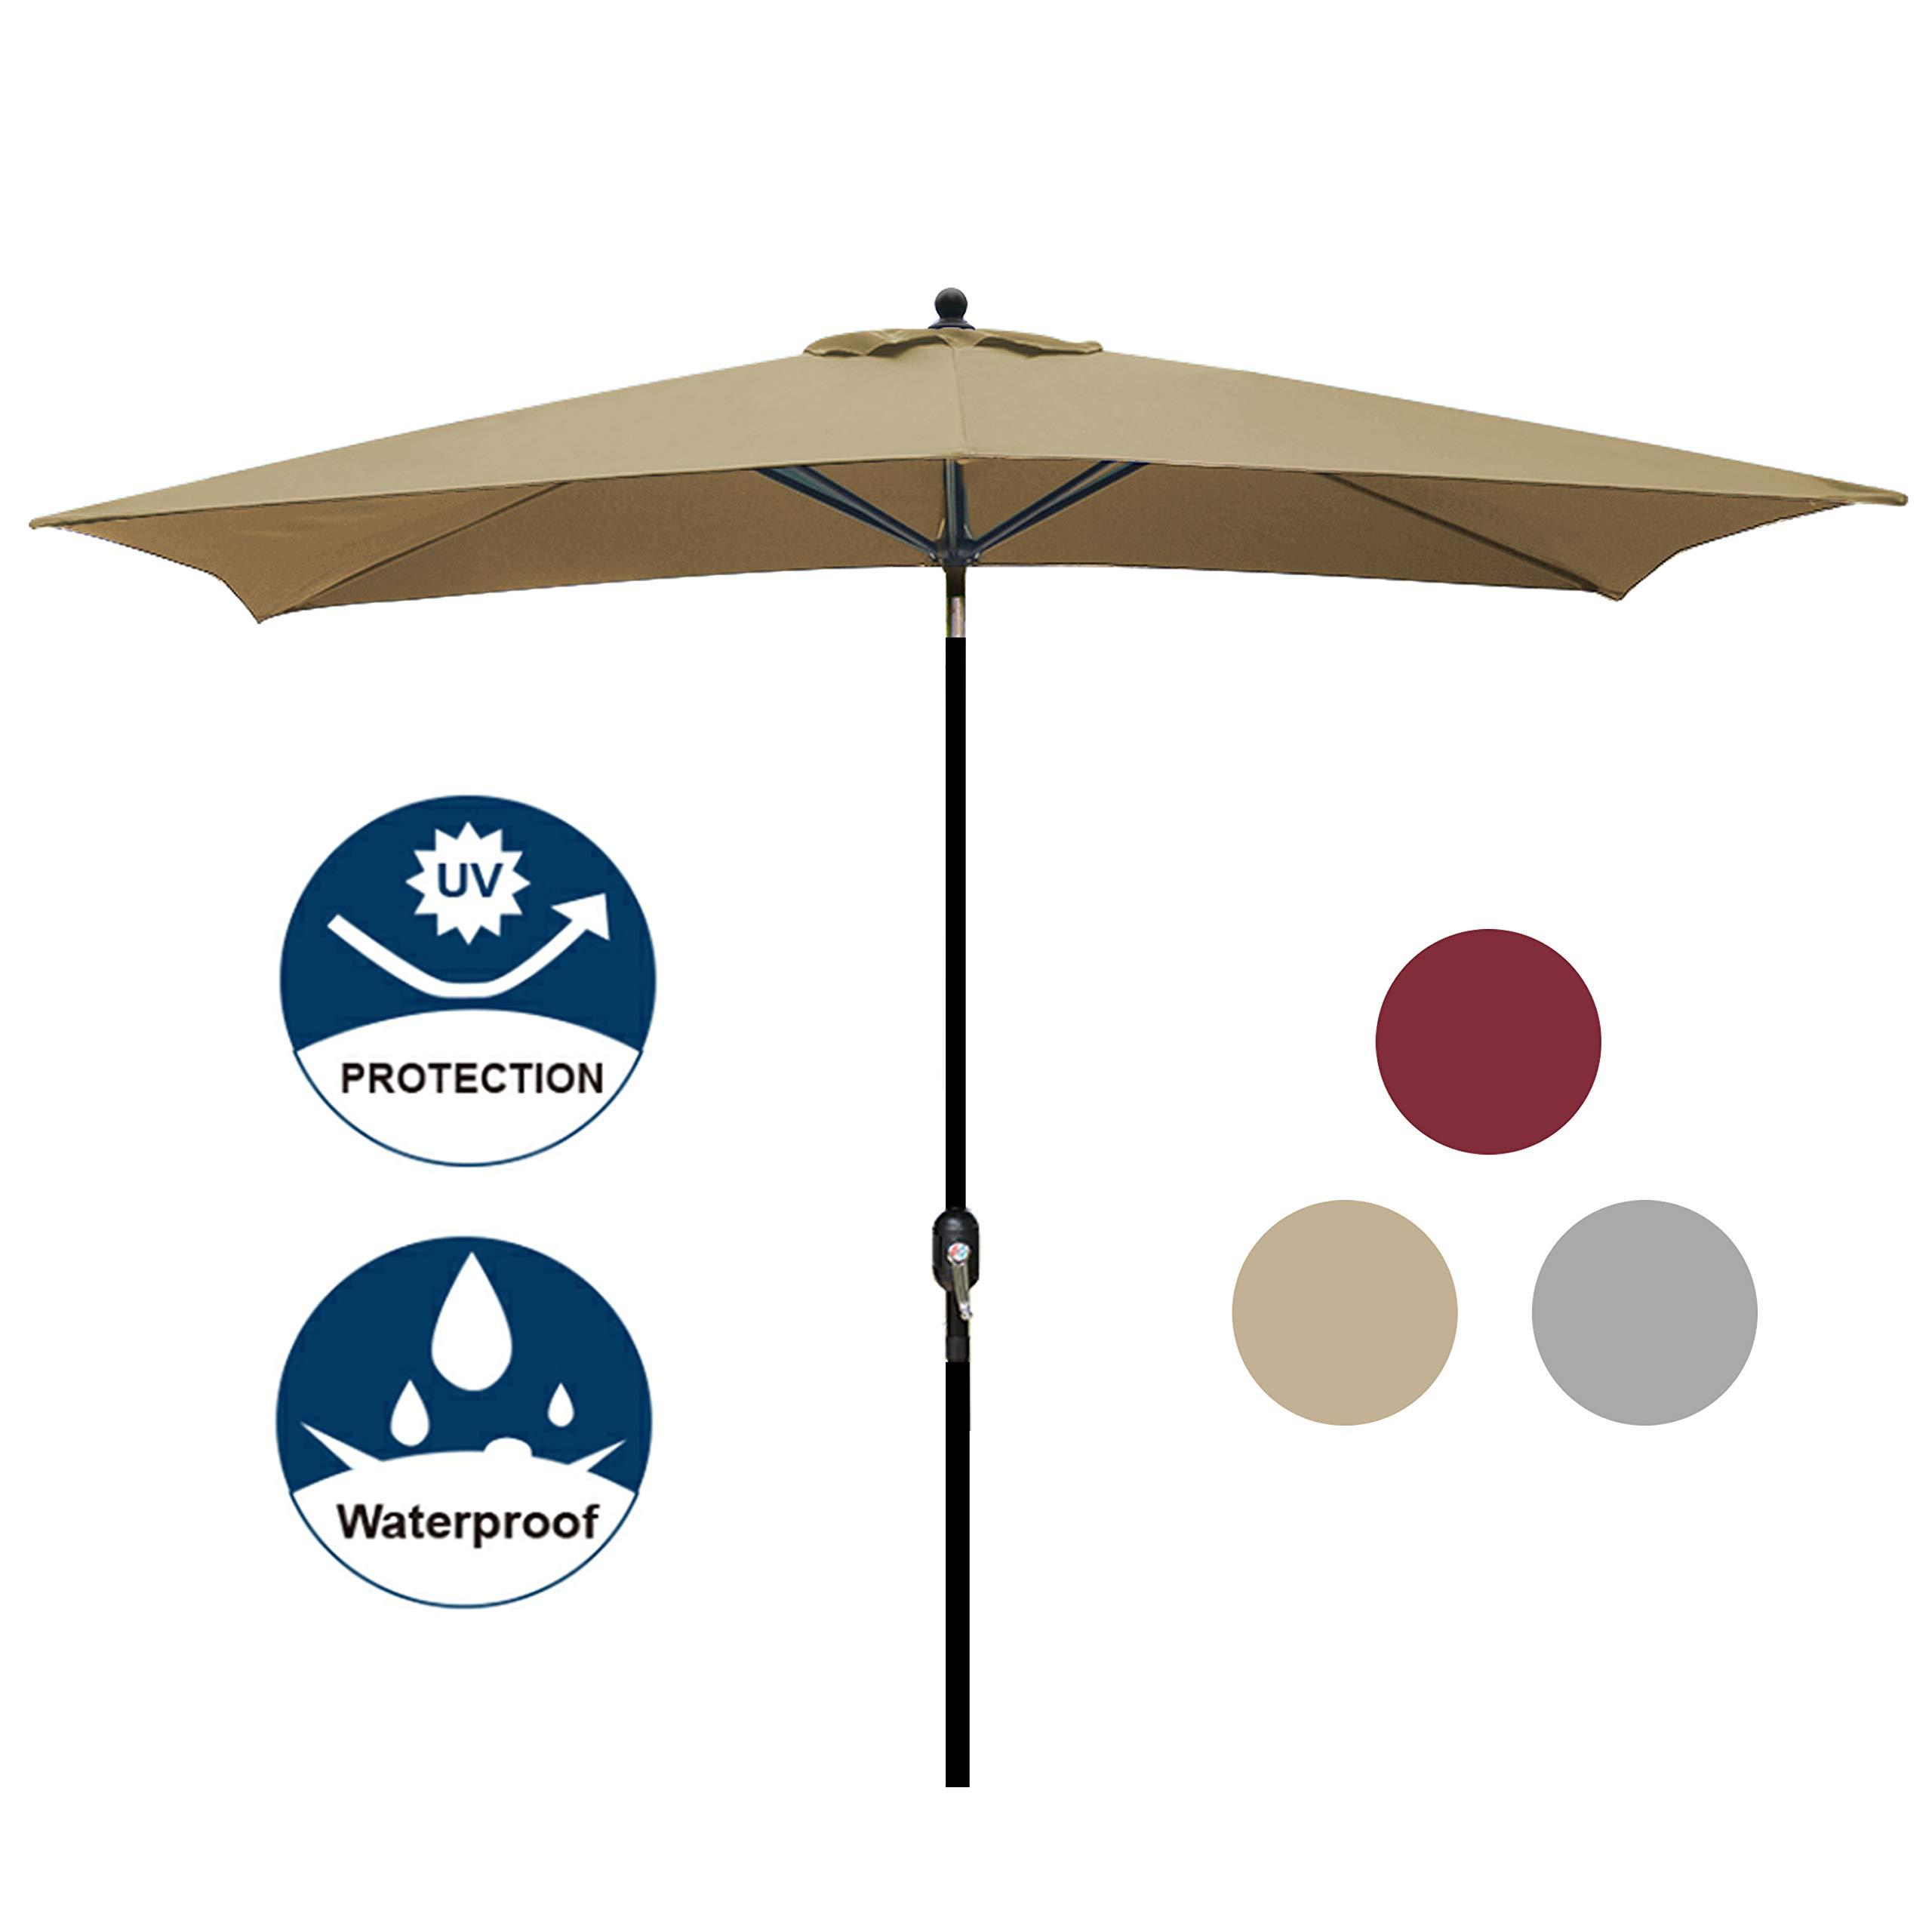 Blissun Rectangular Patio Umbrella Outdoor Market Table Umbrella with Push Button Tilt and Crank, 6.5 by 10 Ft (Tan)